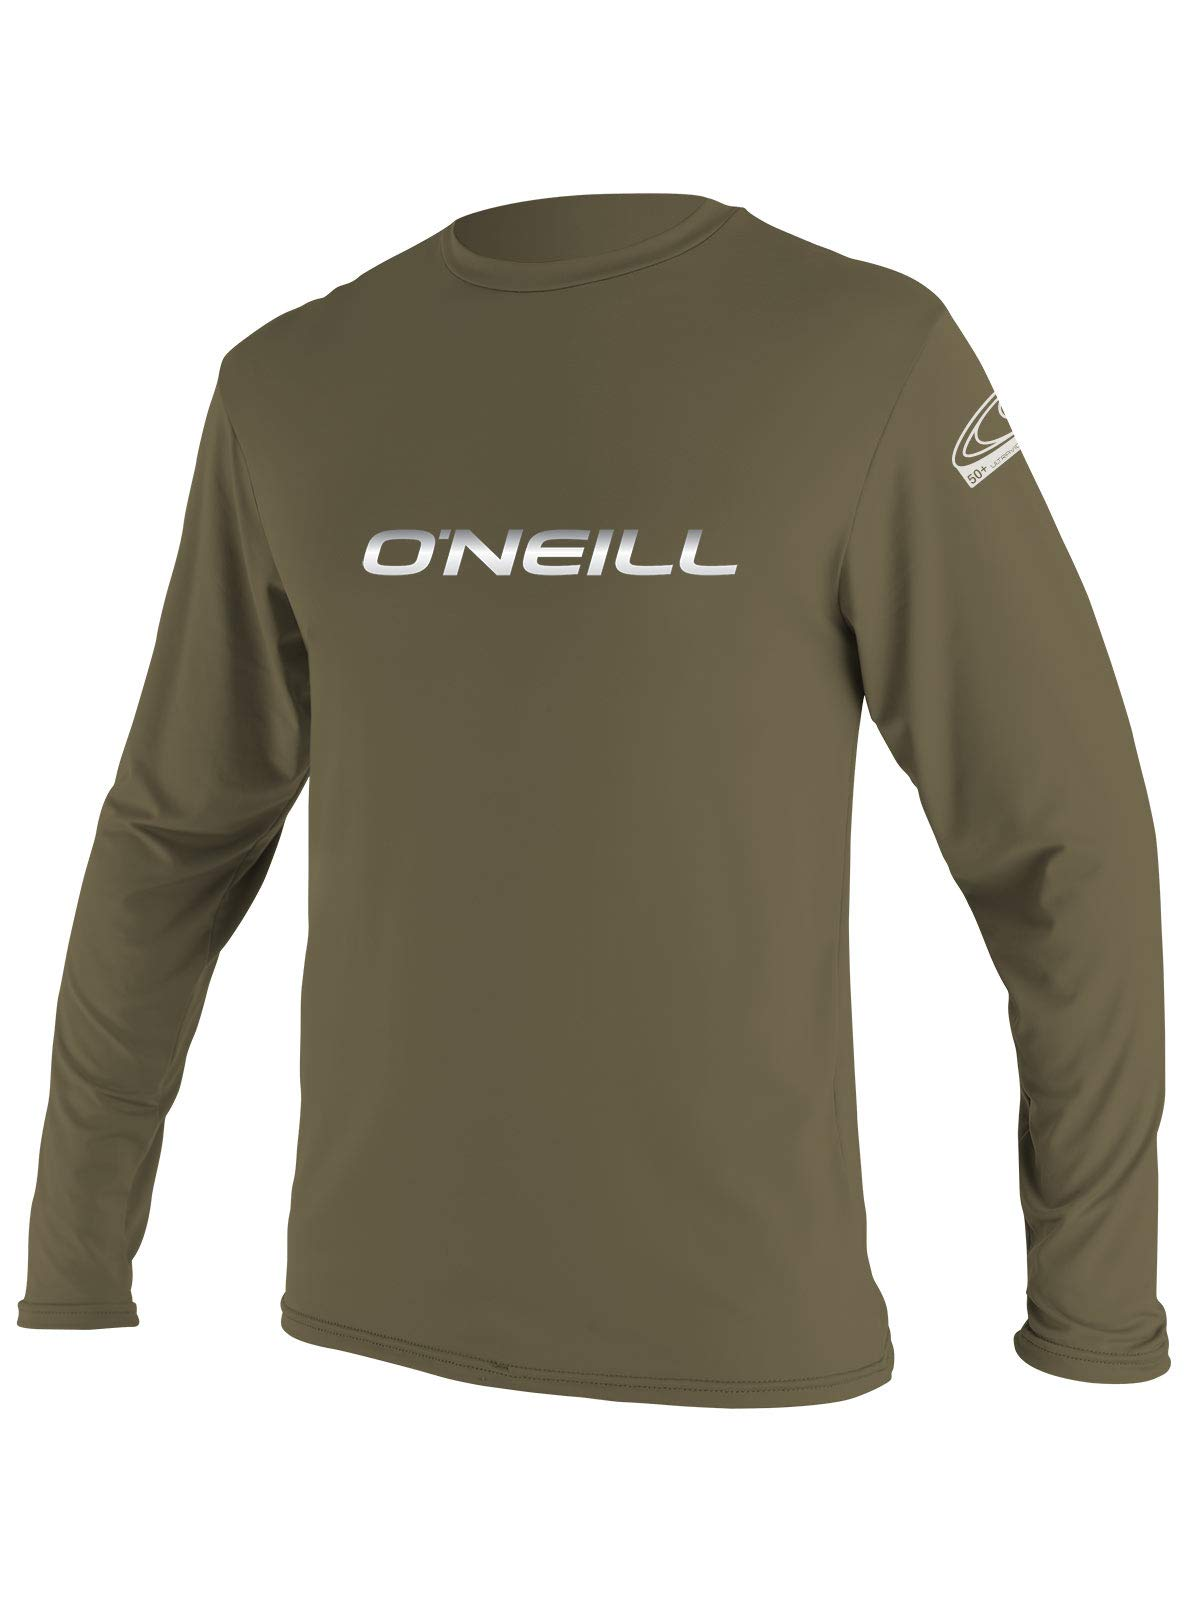 O'Neill Men's Basic Skins Longsleeve Rash Tee 2XLT Khaki (4339IB) by O'Neill Wetsuits